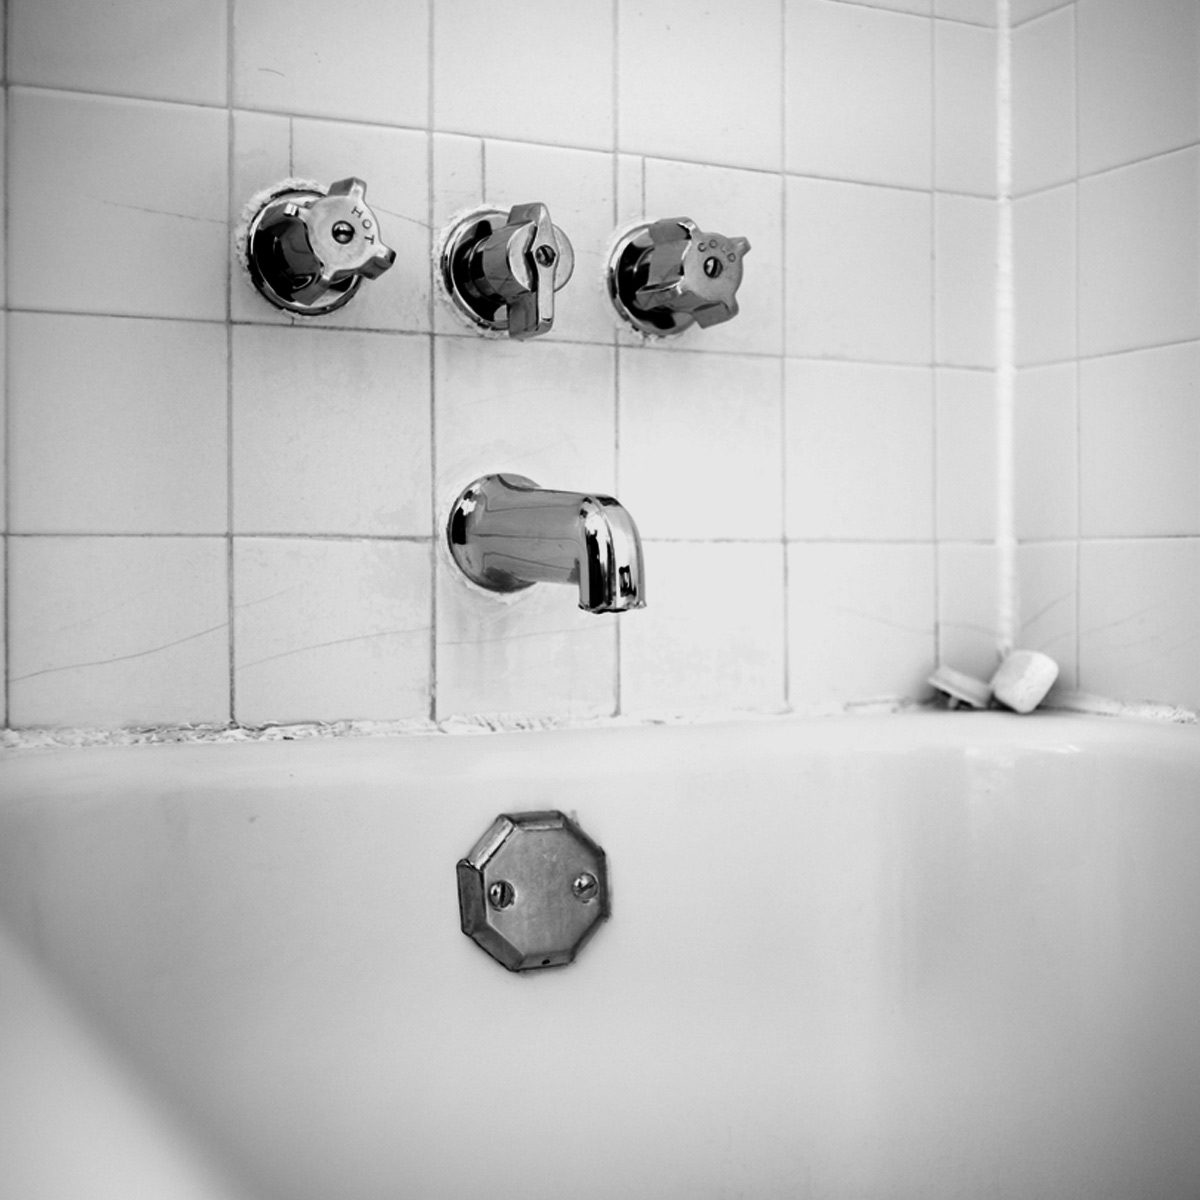 How To Remove Caulk From Tub Diy Family Handyman